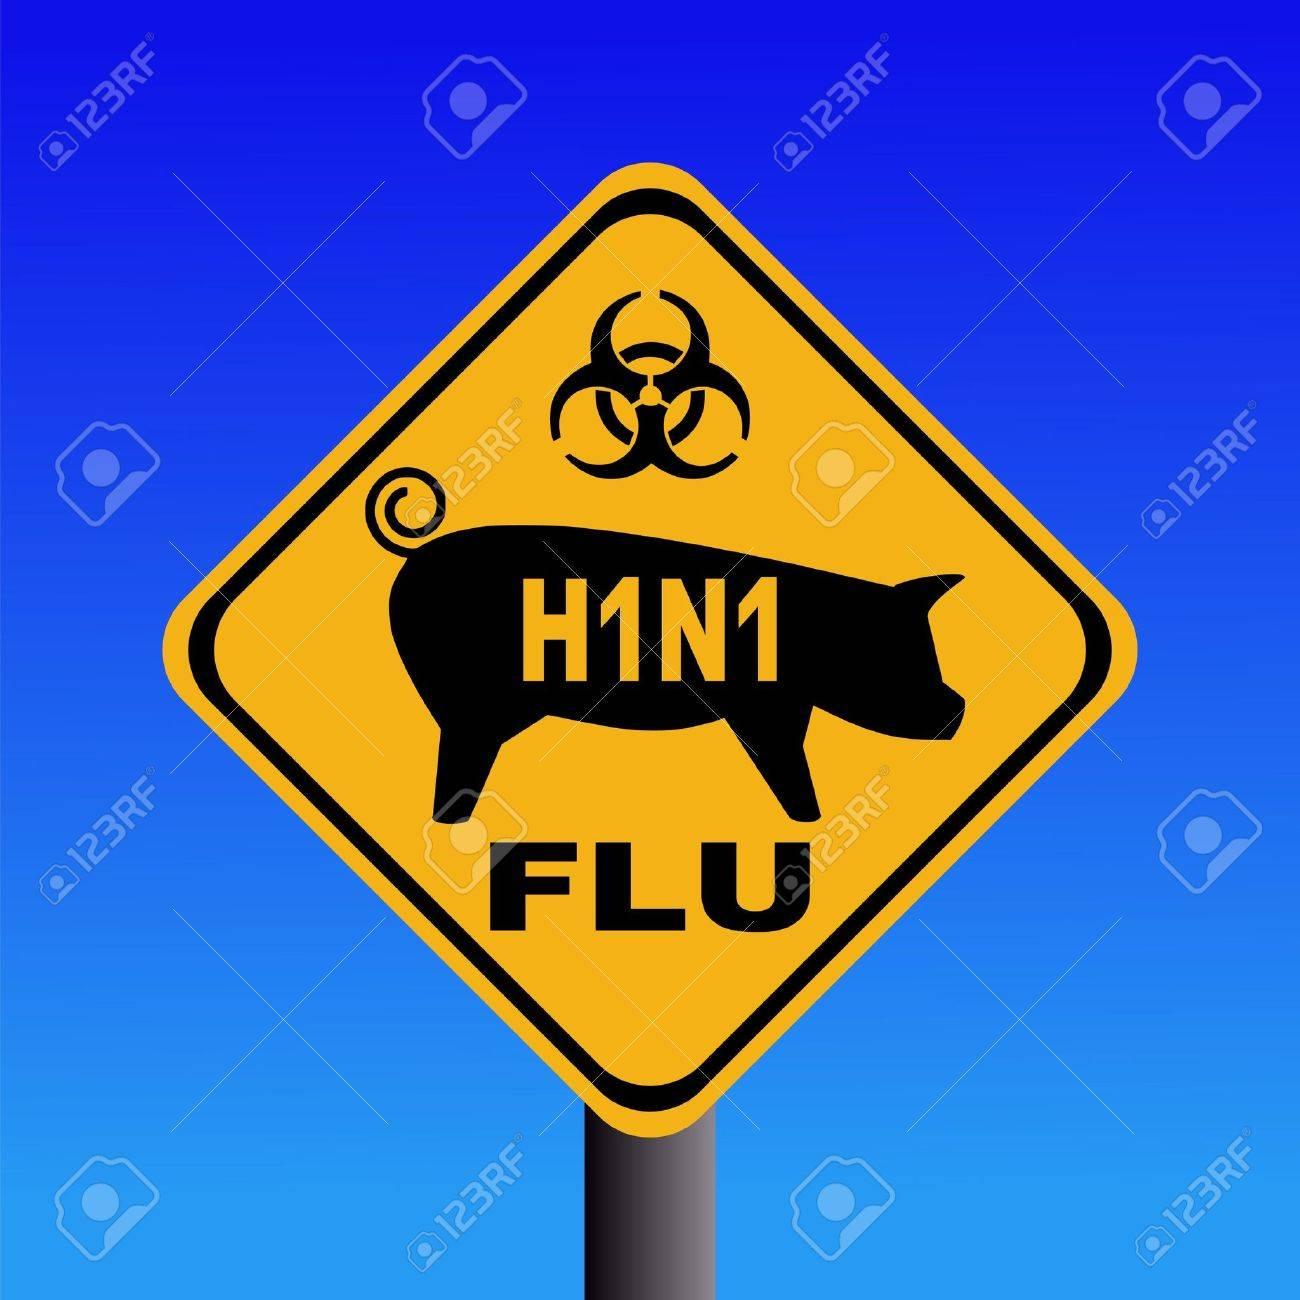 warning swine flu sign on blue illustration Stock Photo - 4771471